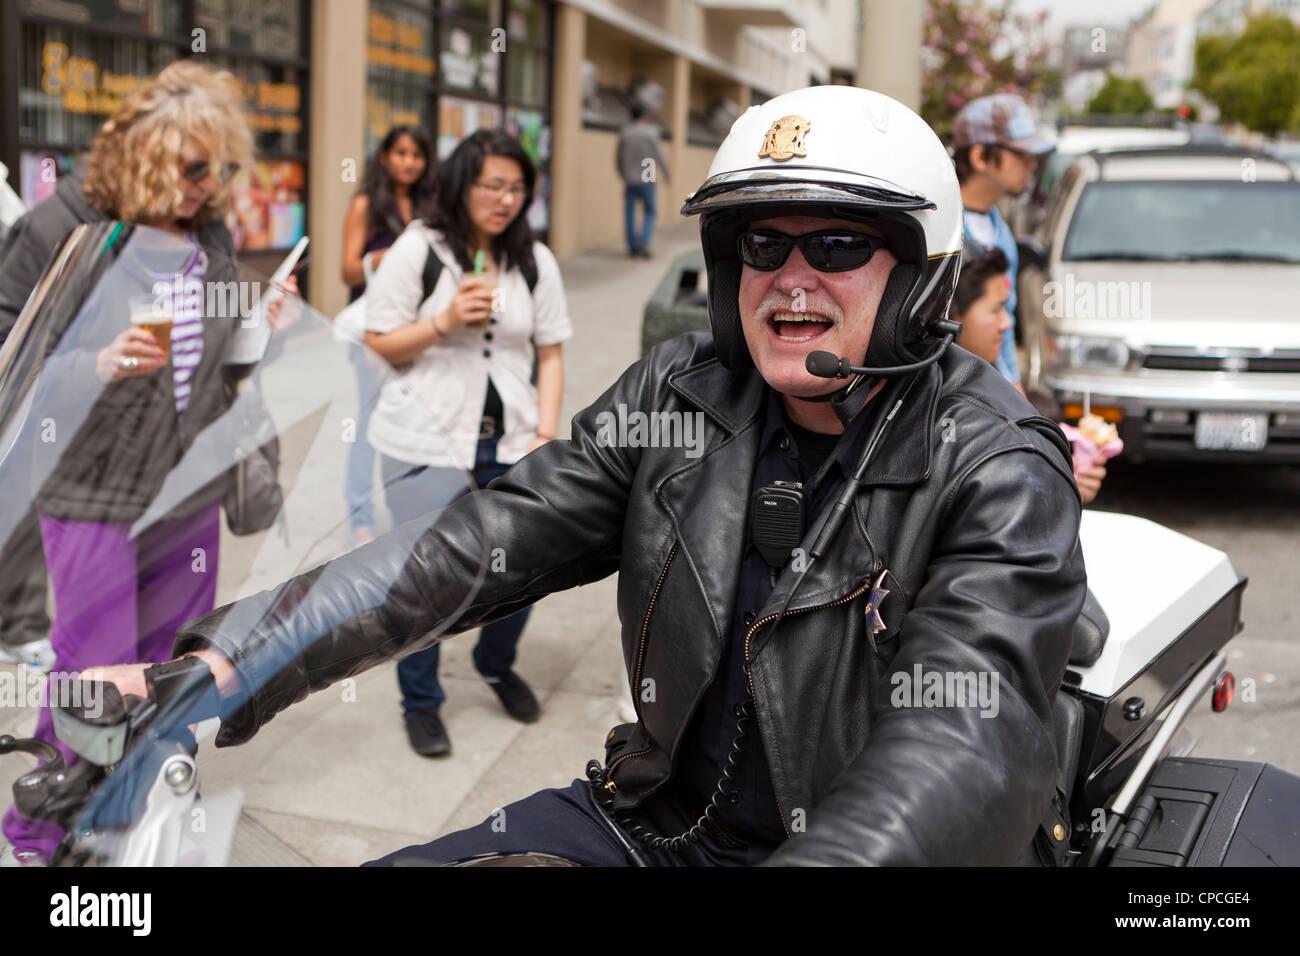 US motorcycle cop - San Francisco, California USA - Stock Image